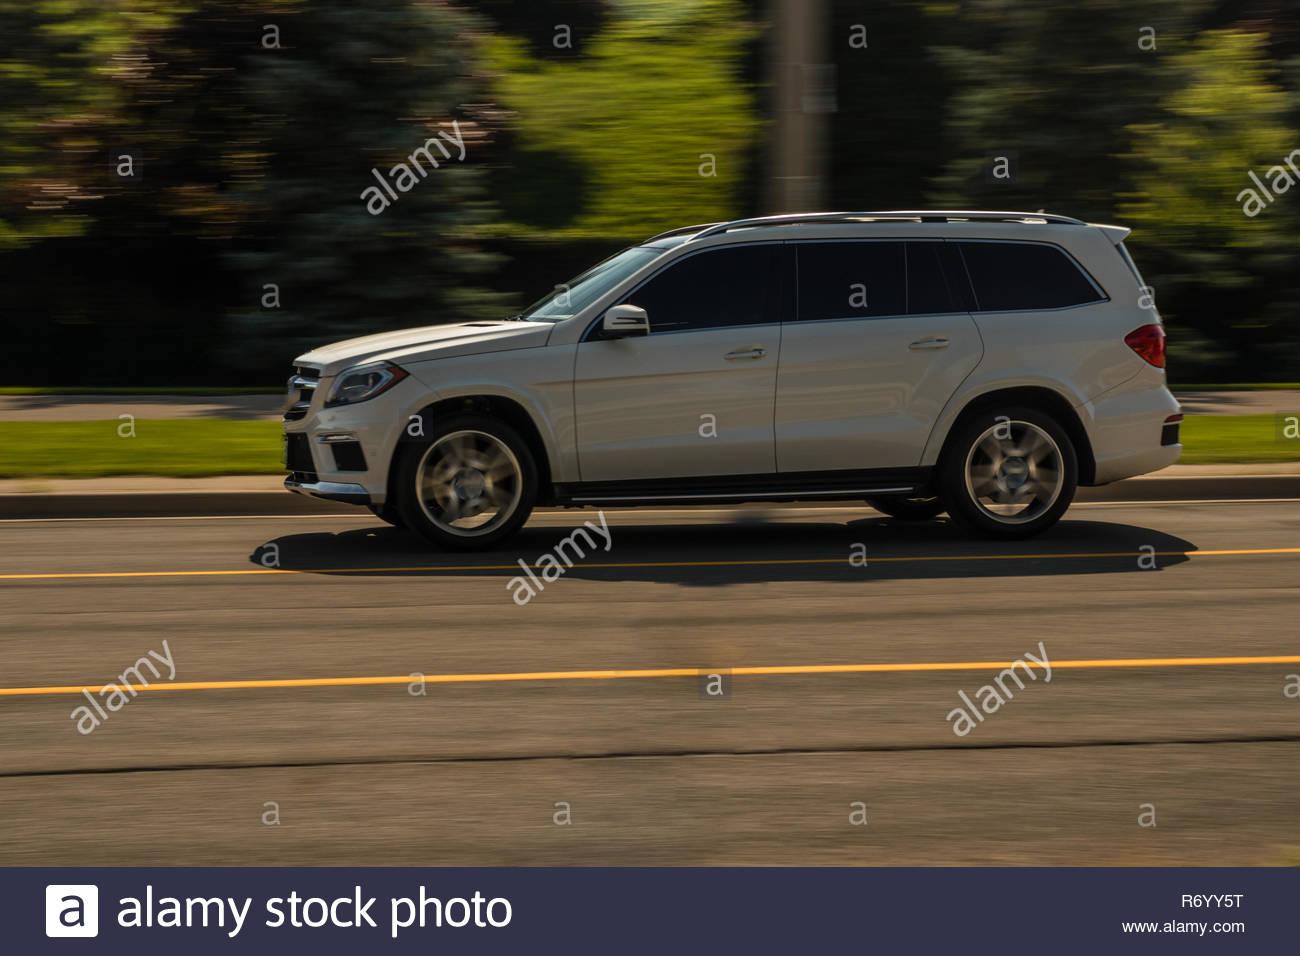 Speeding white SUV zipping near the Golf course - Stock Image